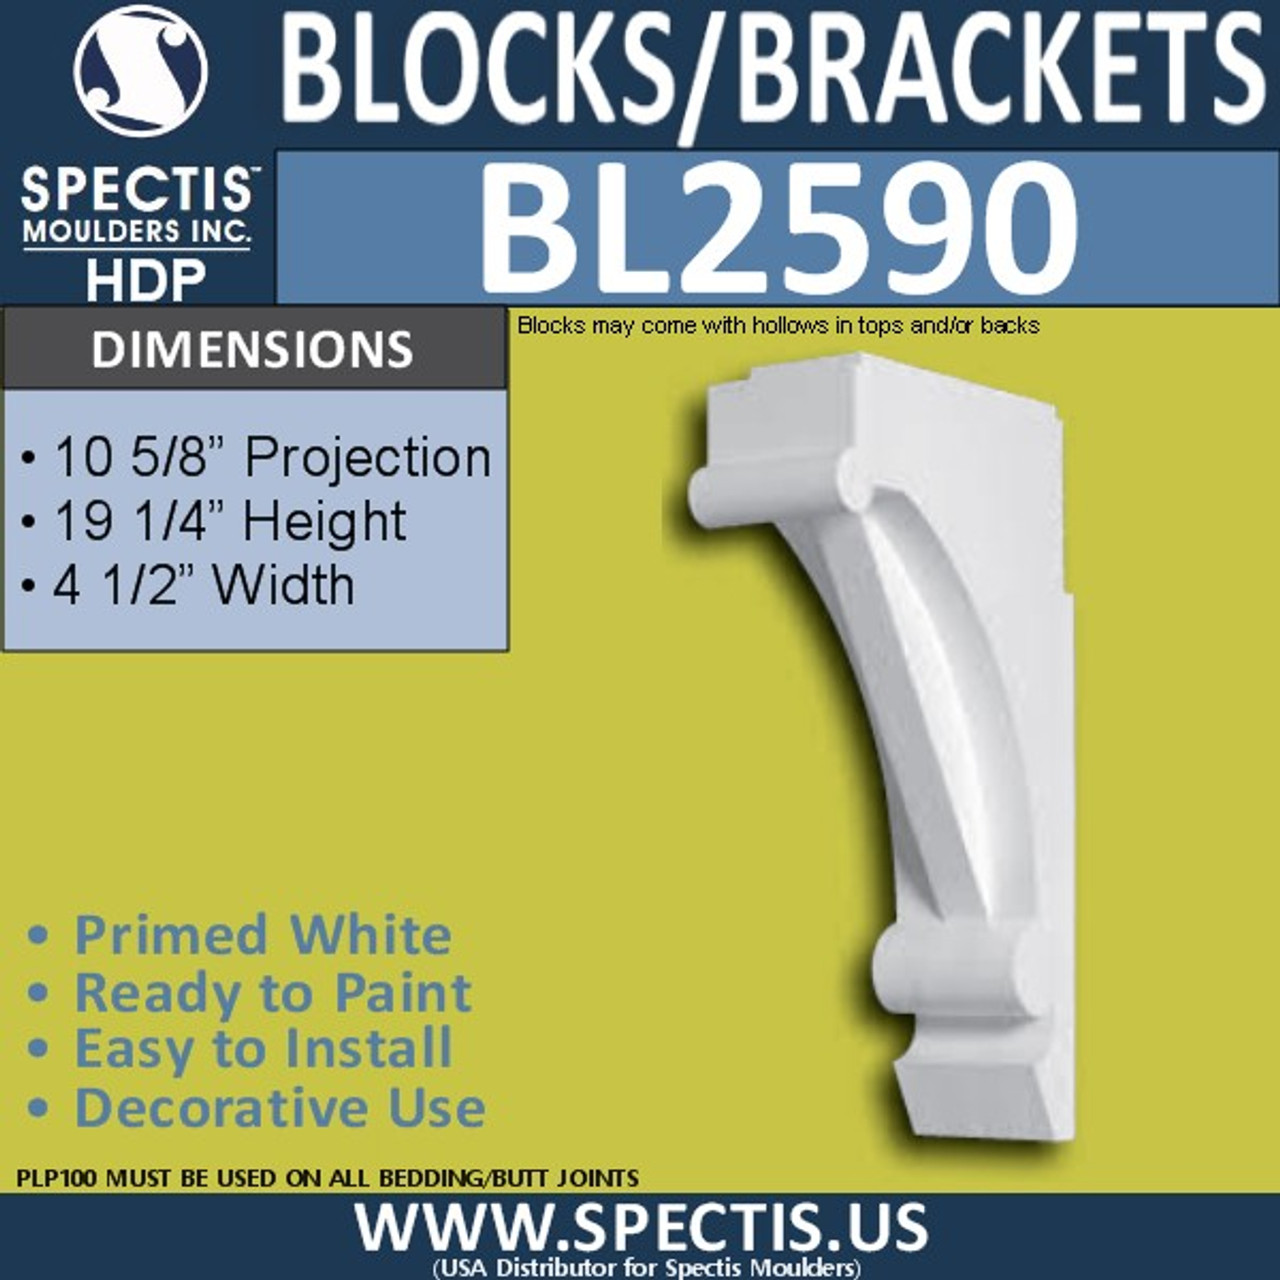 "BL2590 Eave Block or Bracket 4.5""W x 19.25""H x 10.5"" P"